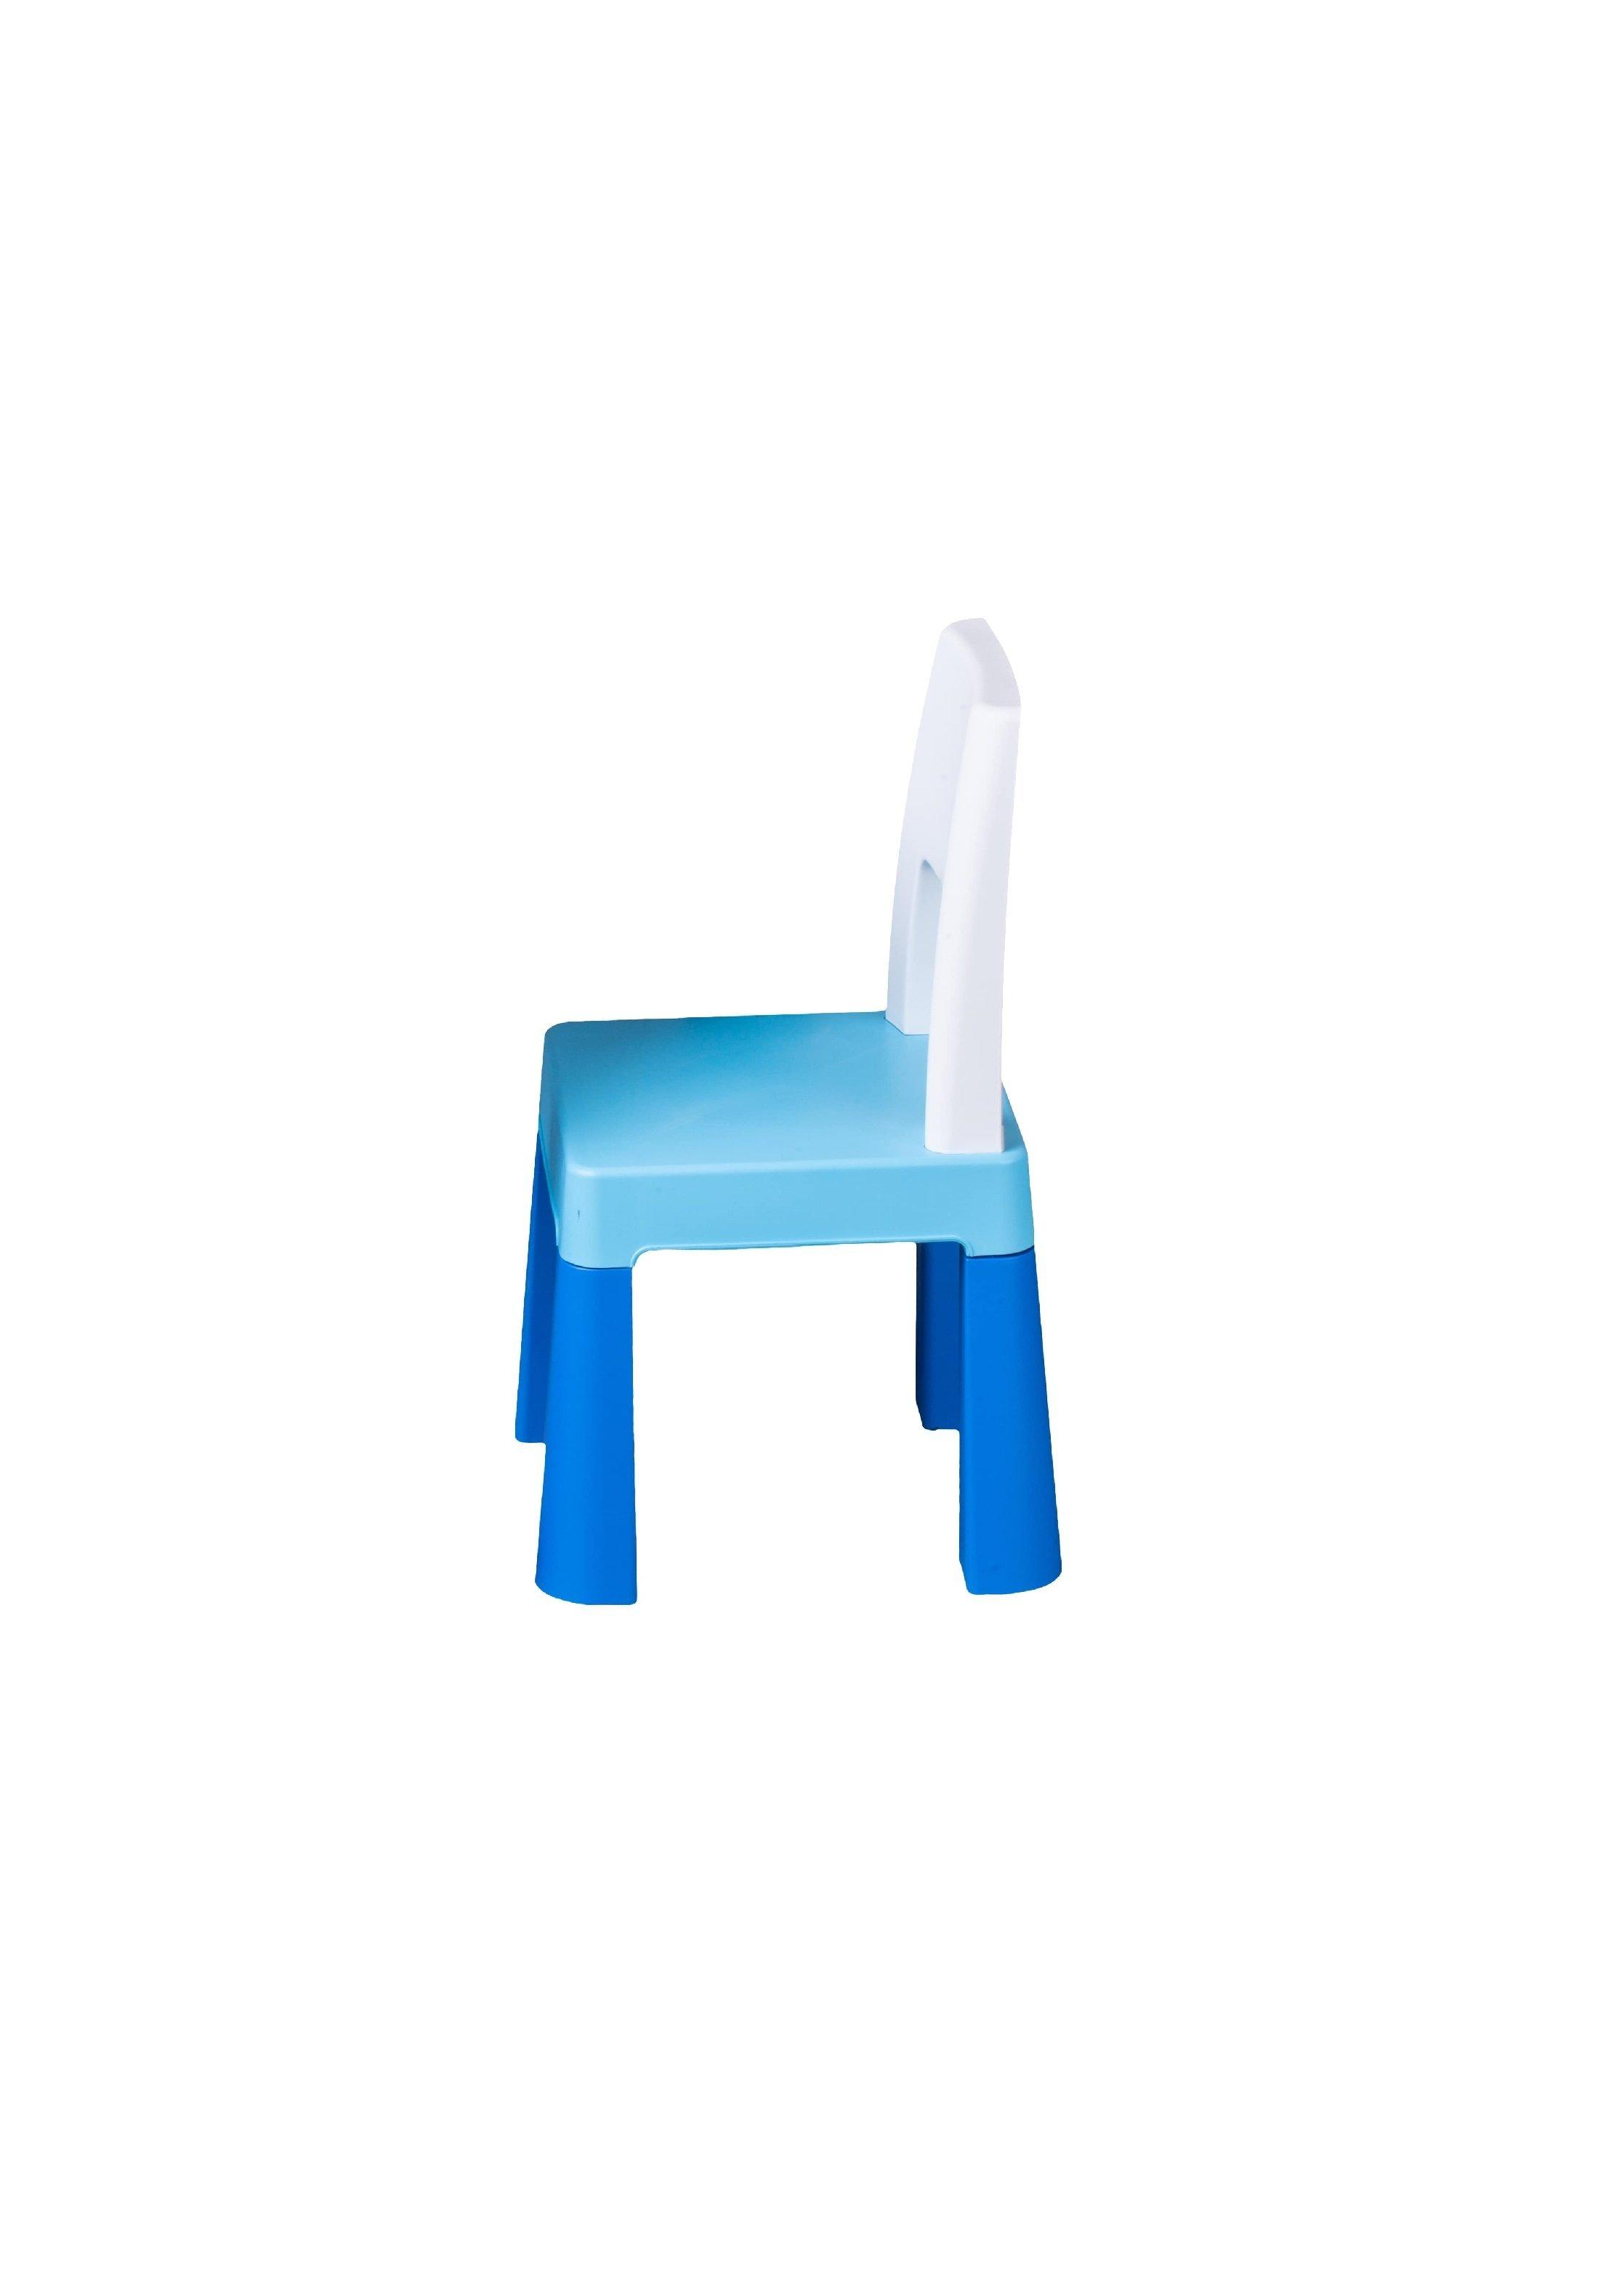 �idli�ka ke stole�ku multifun modr� - zv��i� obr�zok